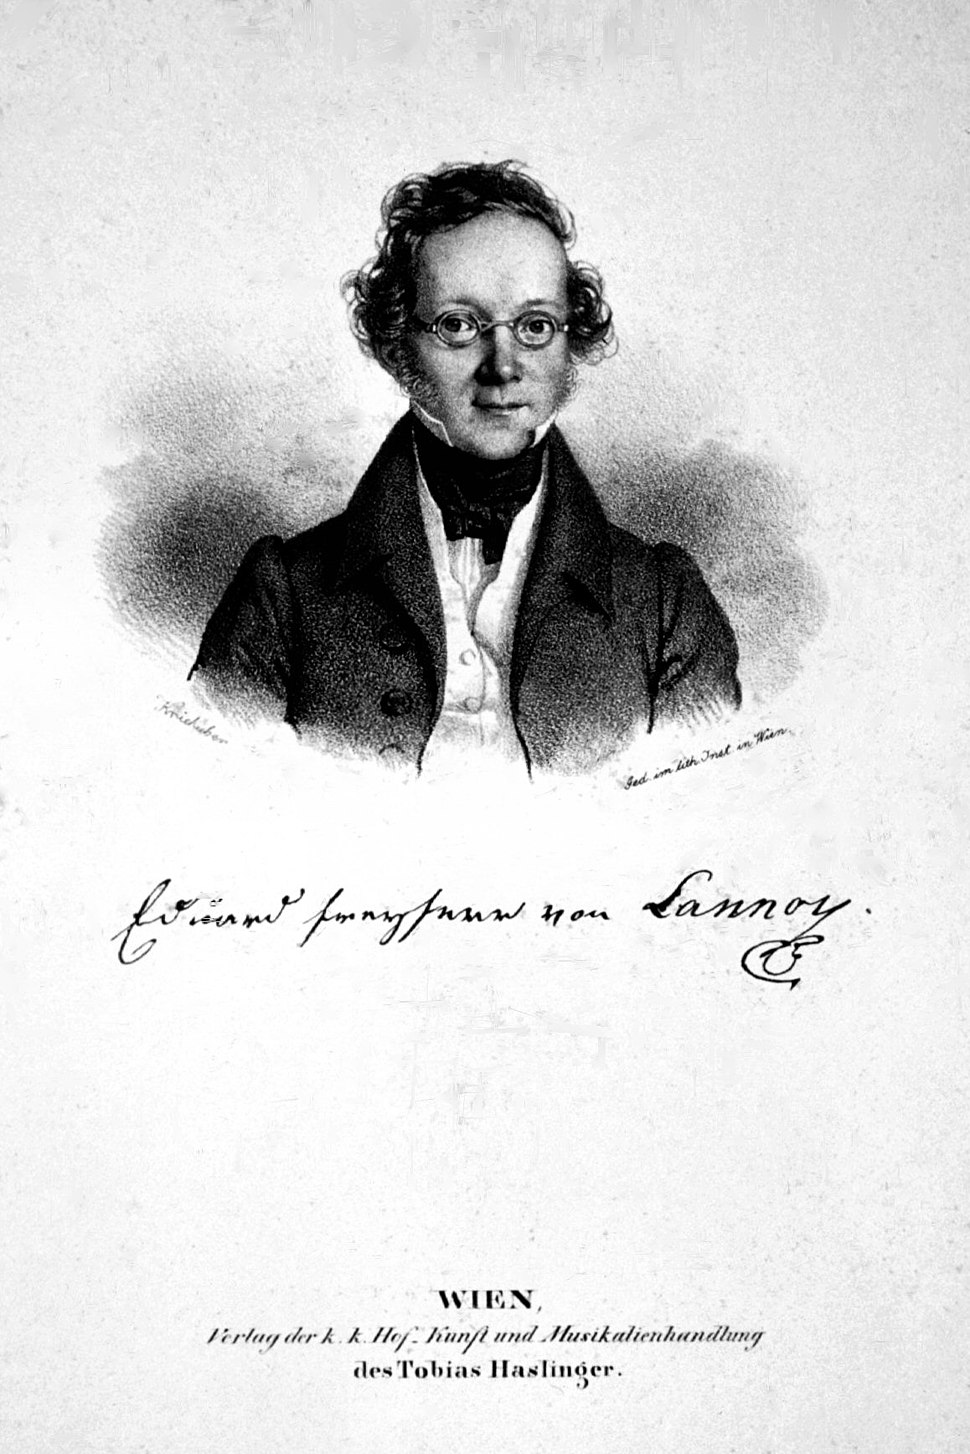 Eduard Lannoy